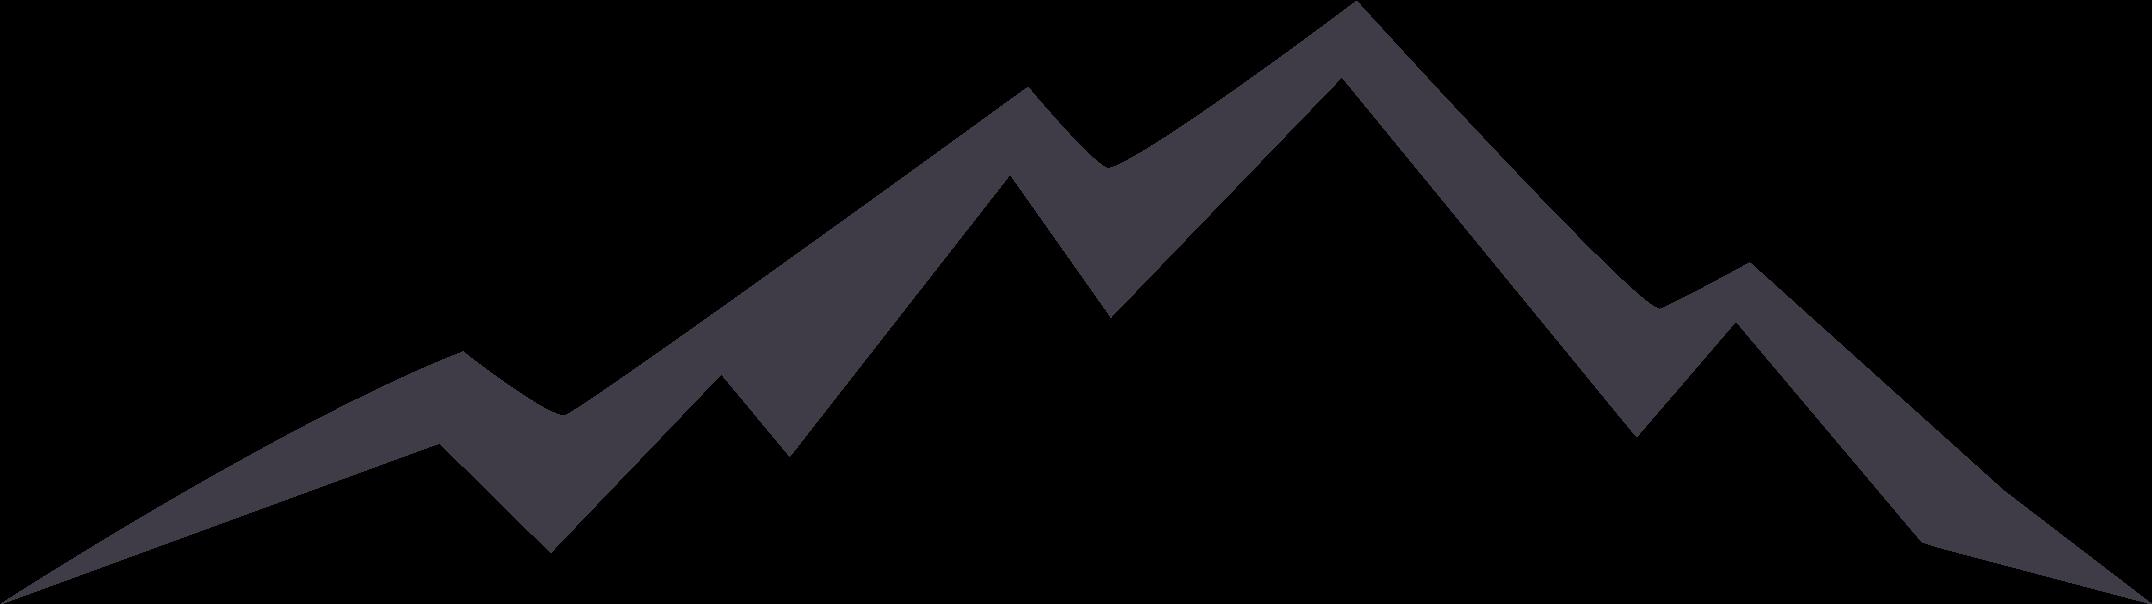 Transparent mountains clip art - Euclidean Vector Silhouette Icon Mountain Hq Image - Free Mountain Logo Png